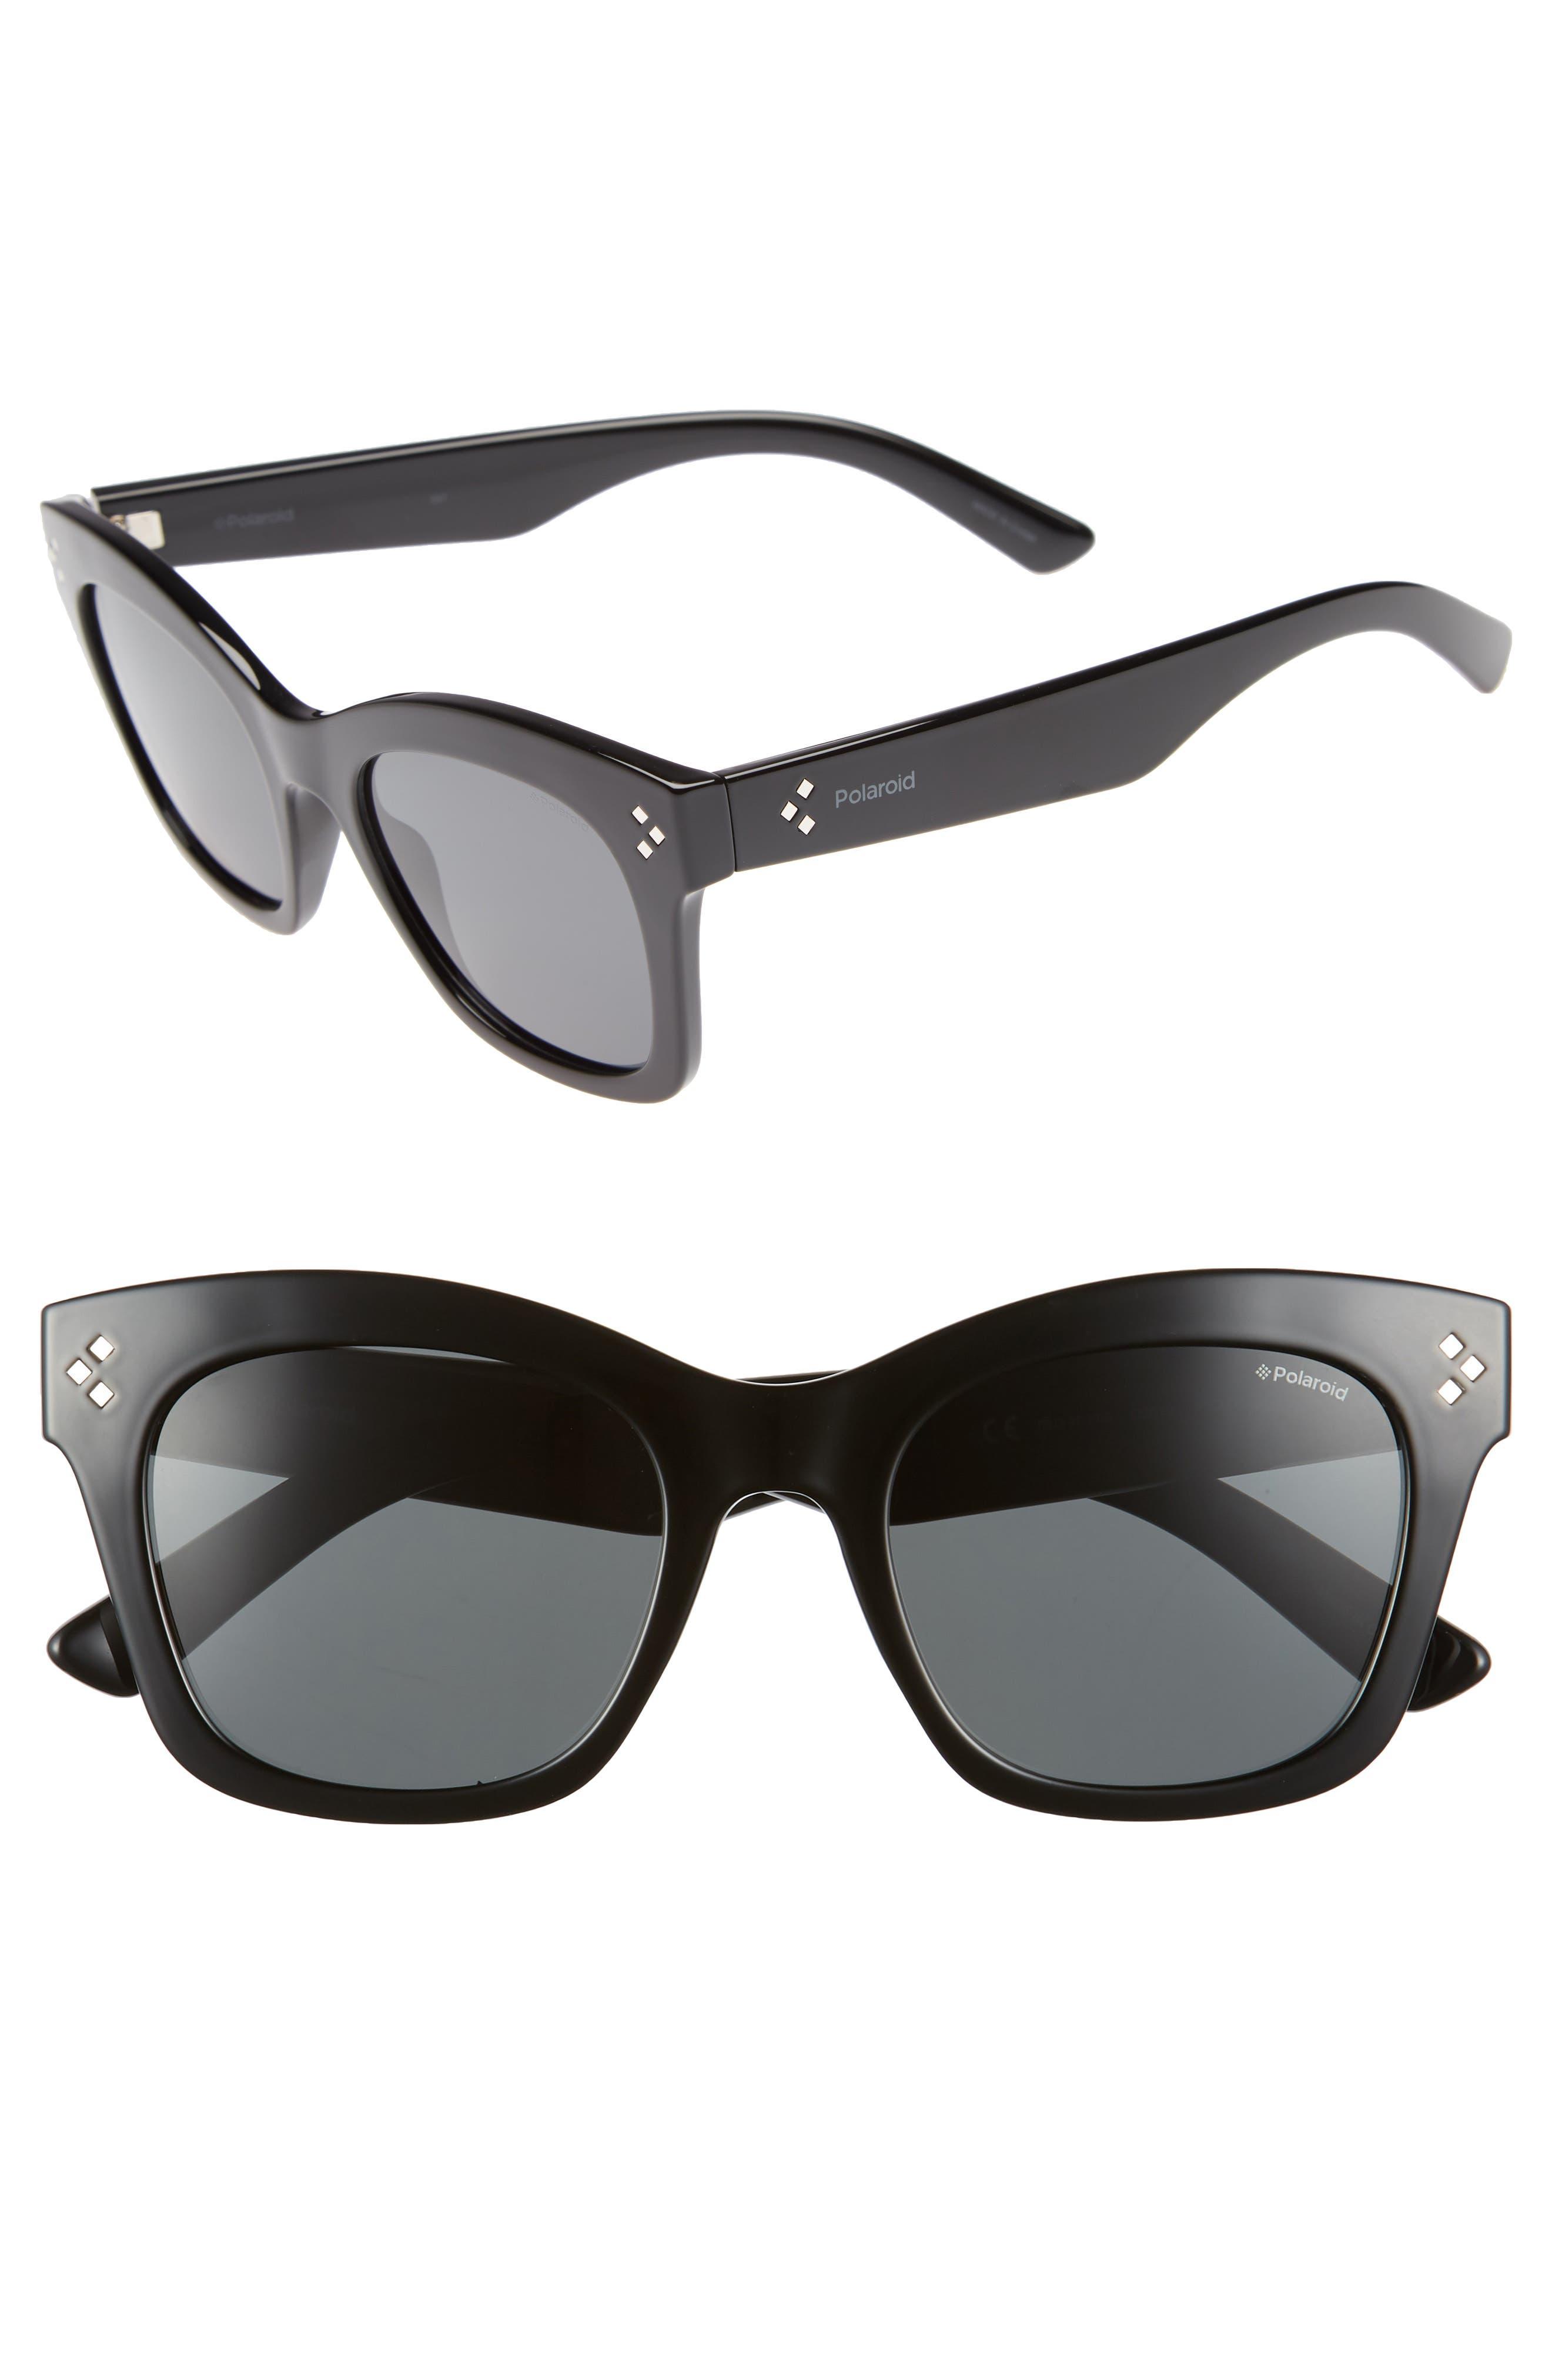 Core 51mm Polarized Sunglasses,                             Main thumbnail 1, color,                             001